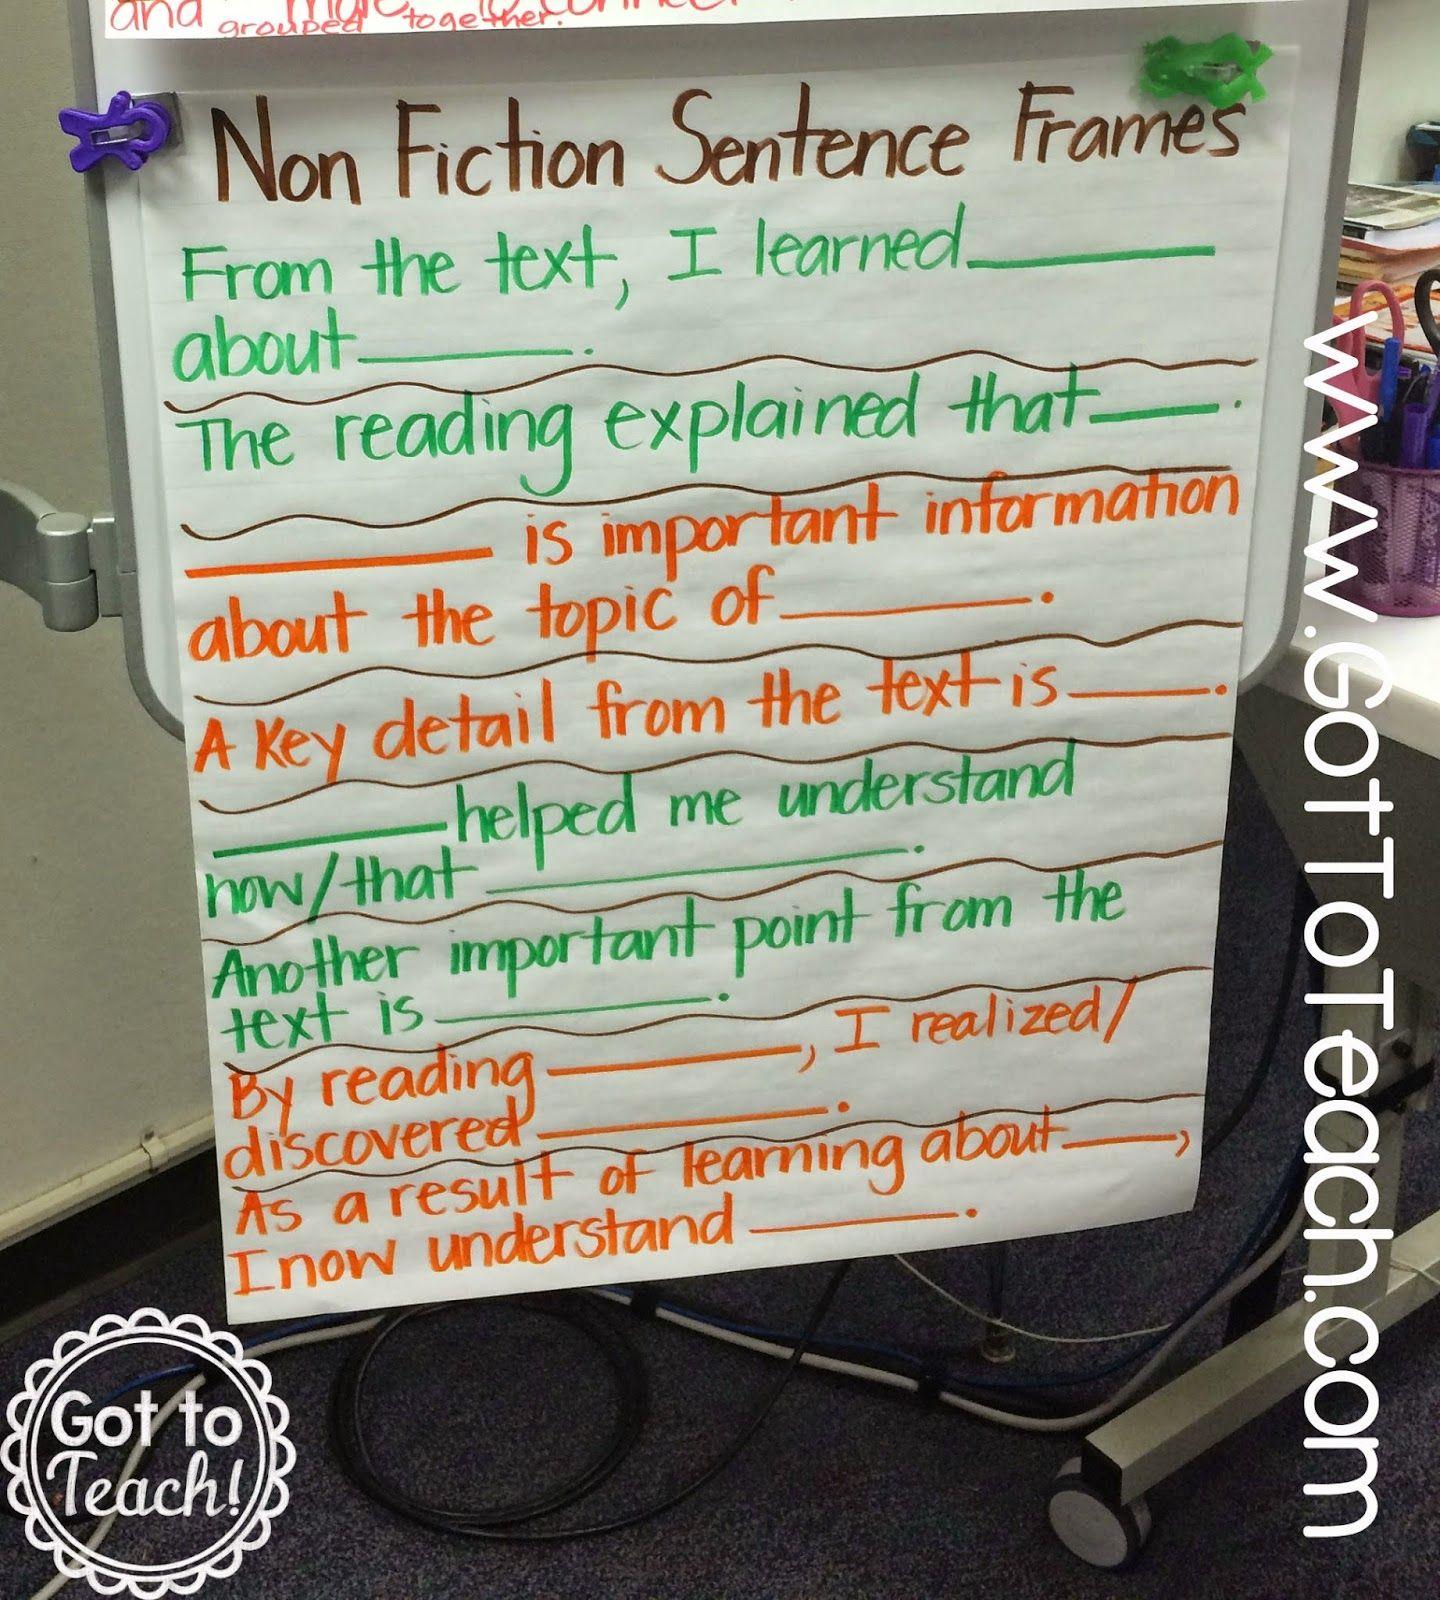 Nonfiction Summary Sentence Frames